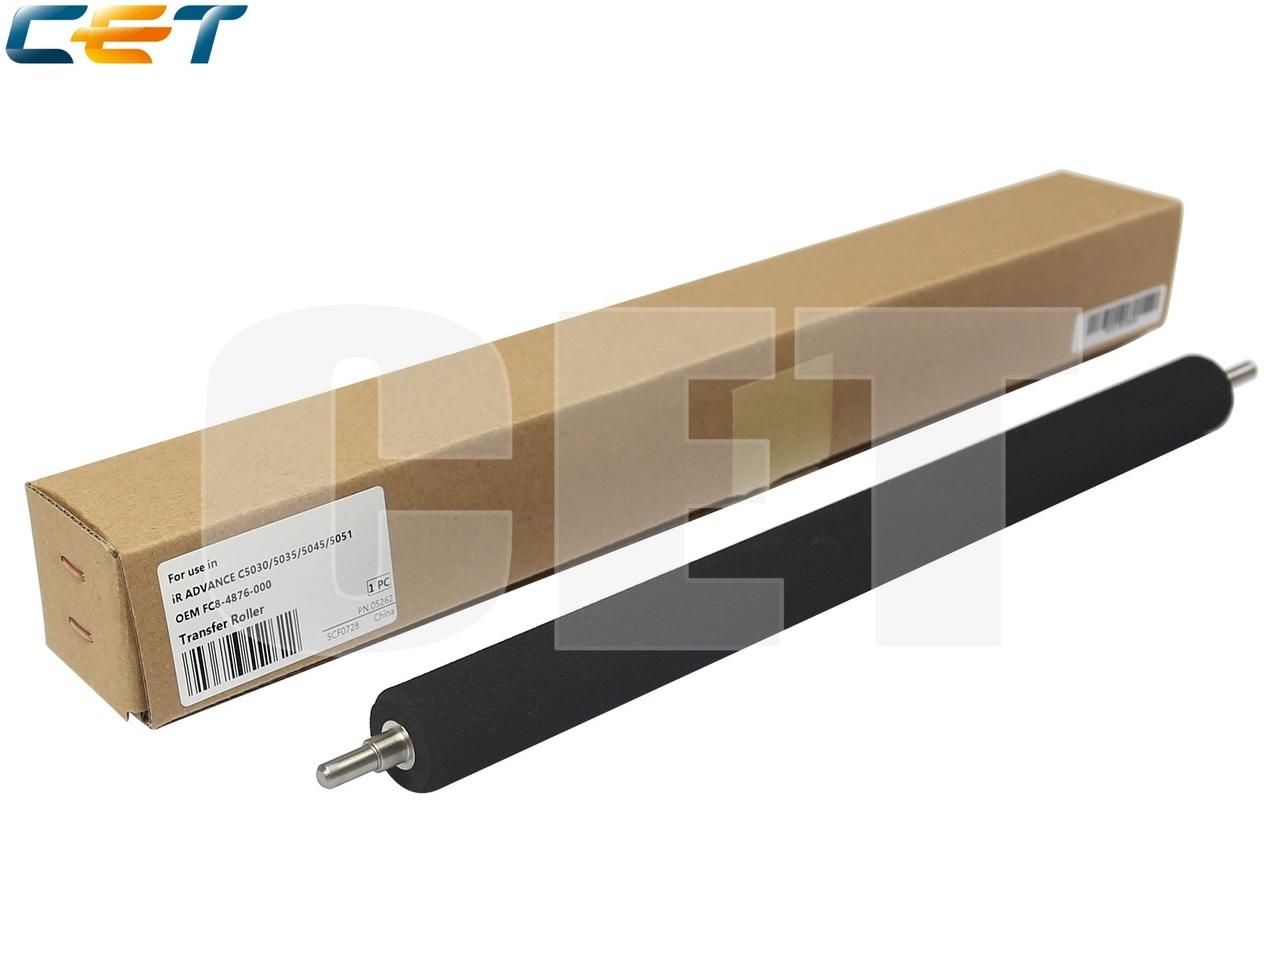 Ролик переноса FC8-4876-000 для CANON iR ADVANCEC5030/C5035/C5045/C5051/C5235/C5240/C5250/C5255 (CET),CET5262